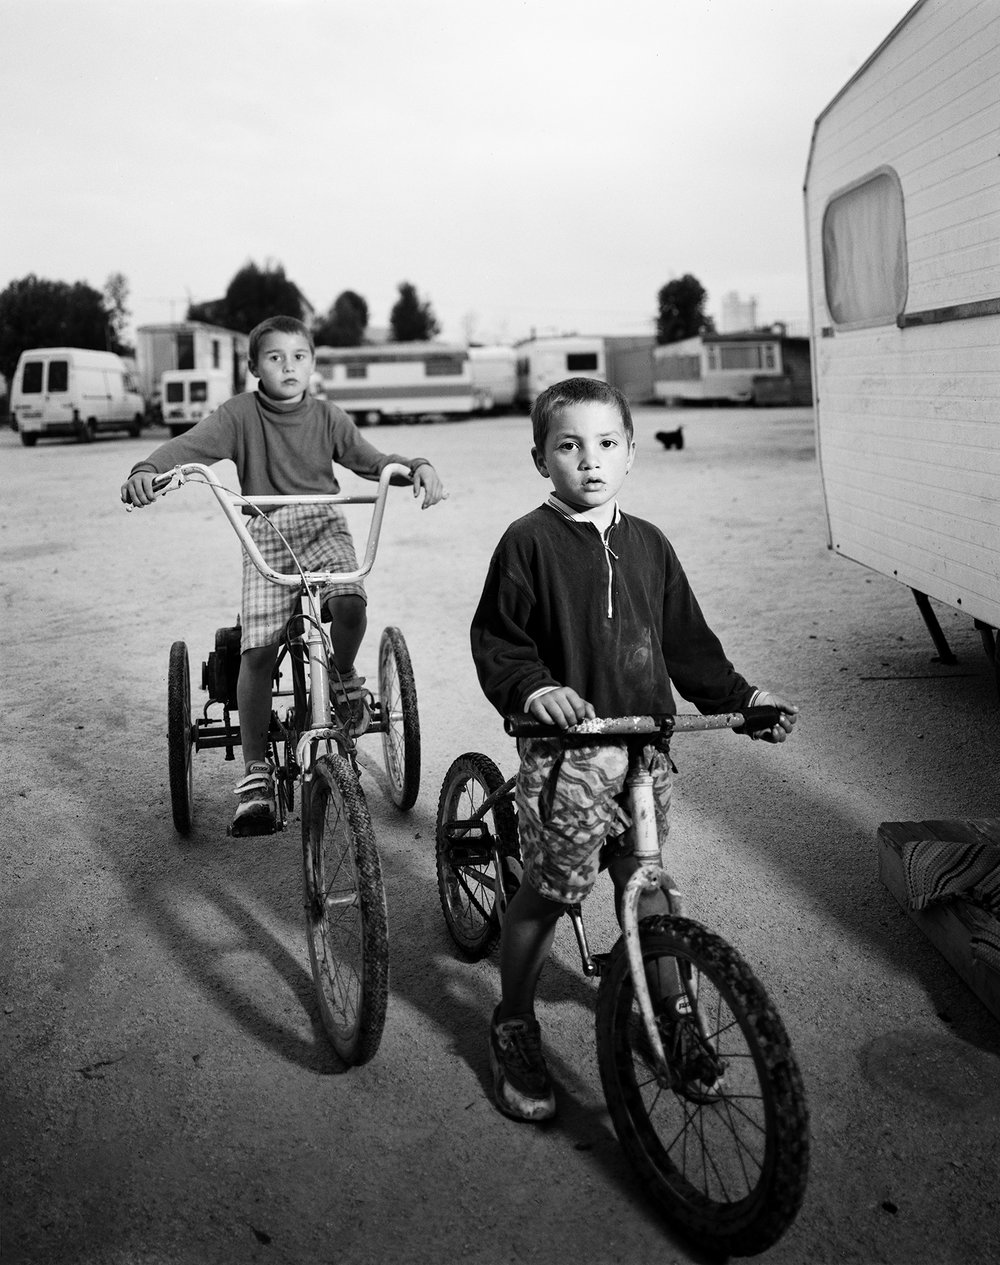 Gypsie_festival-d'heyere009.jpg